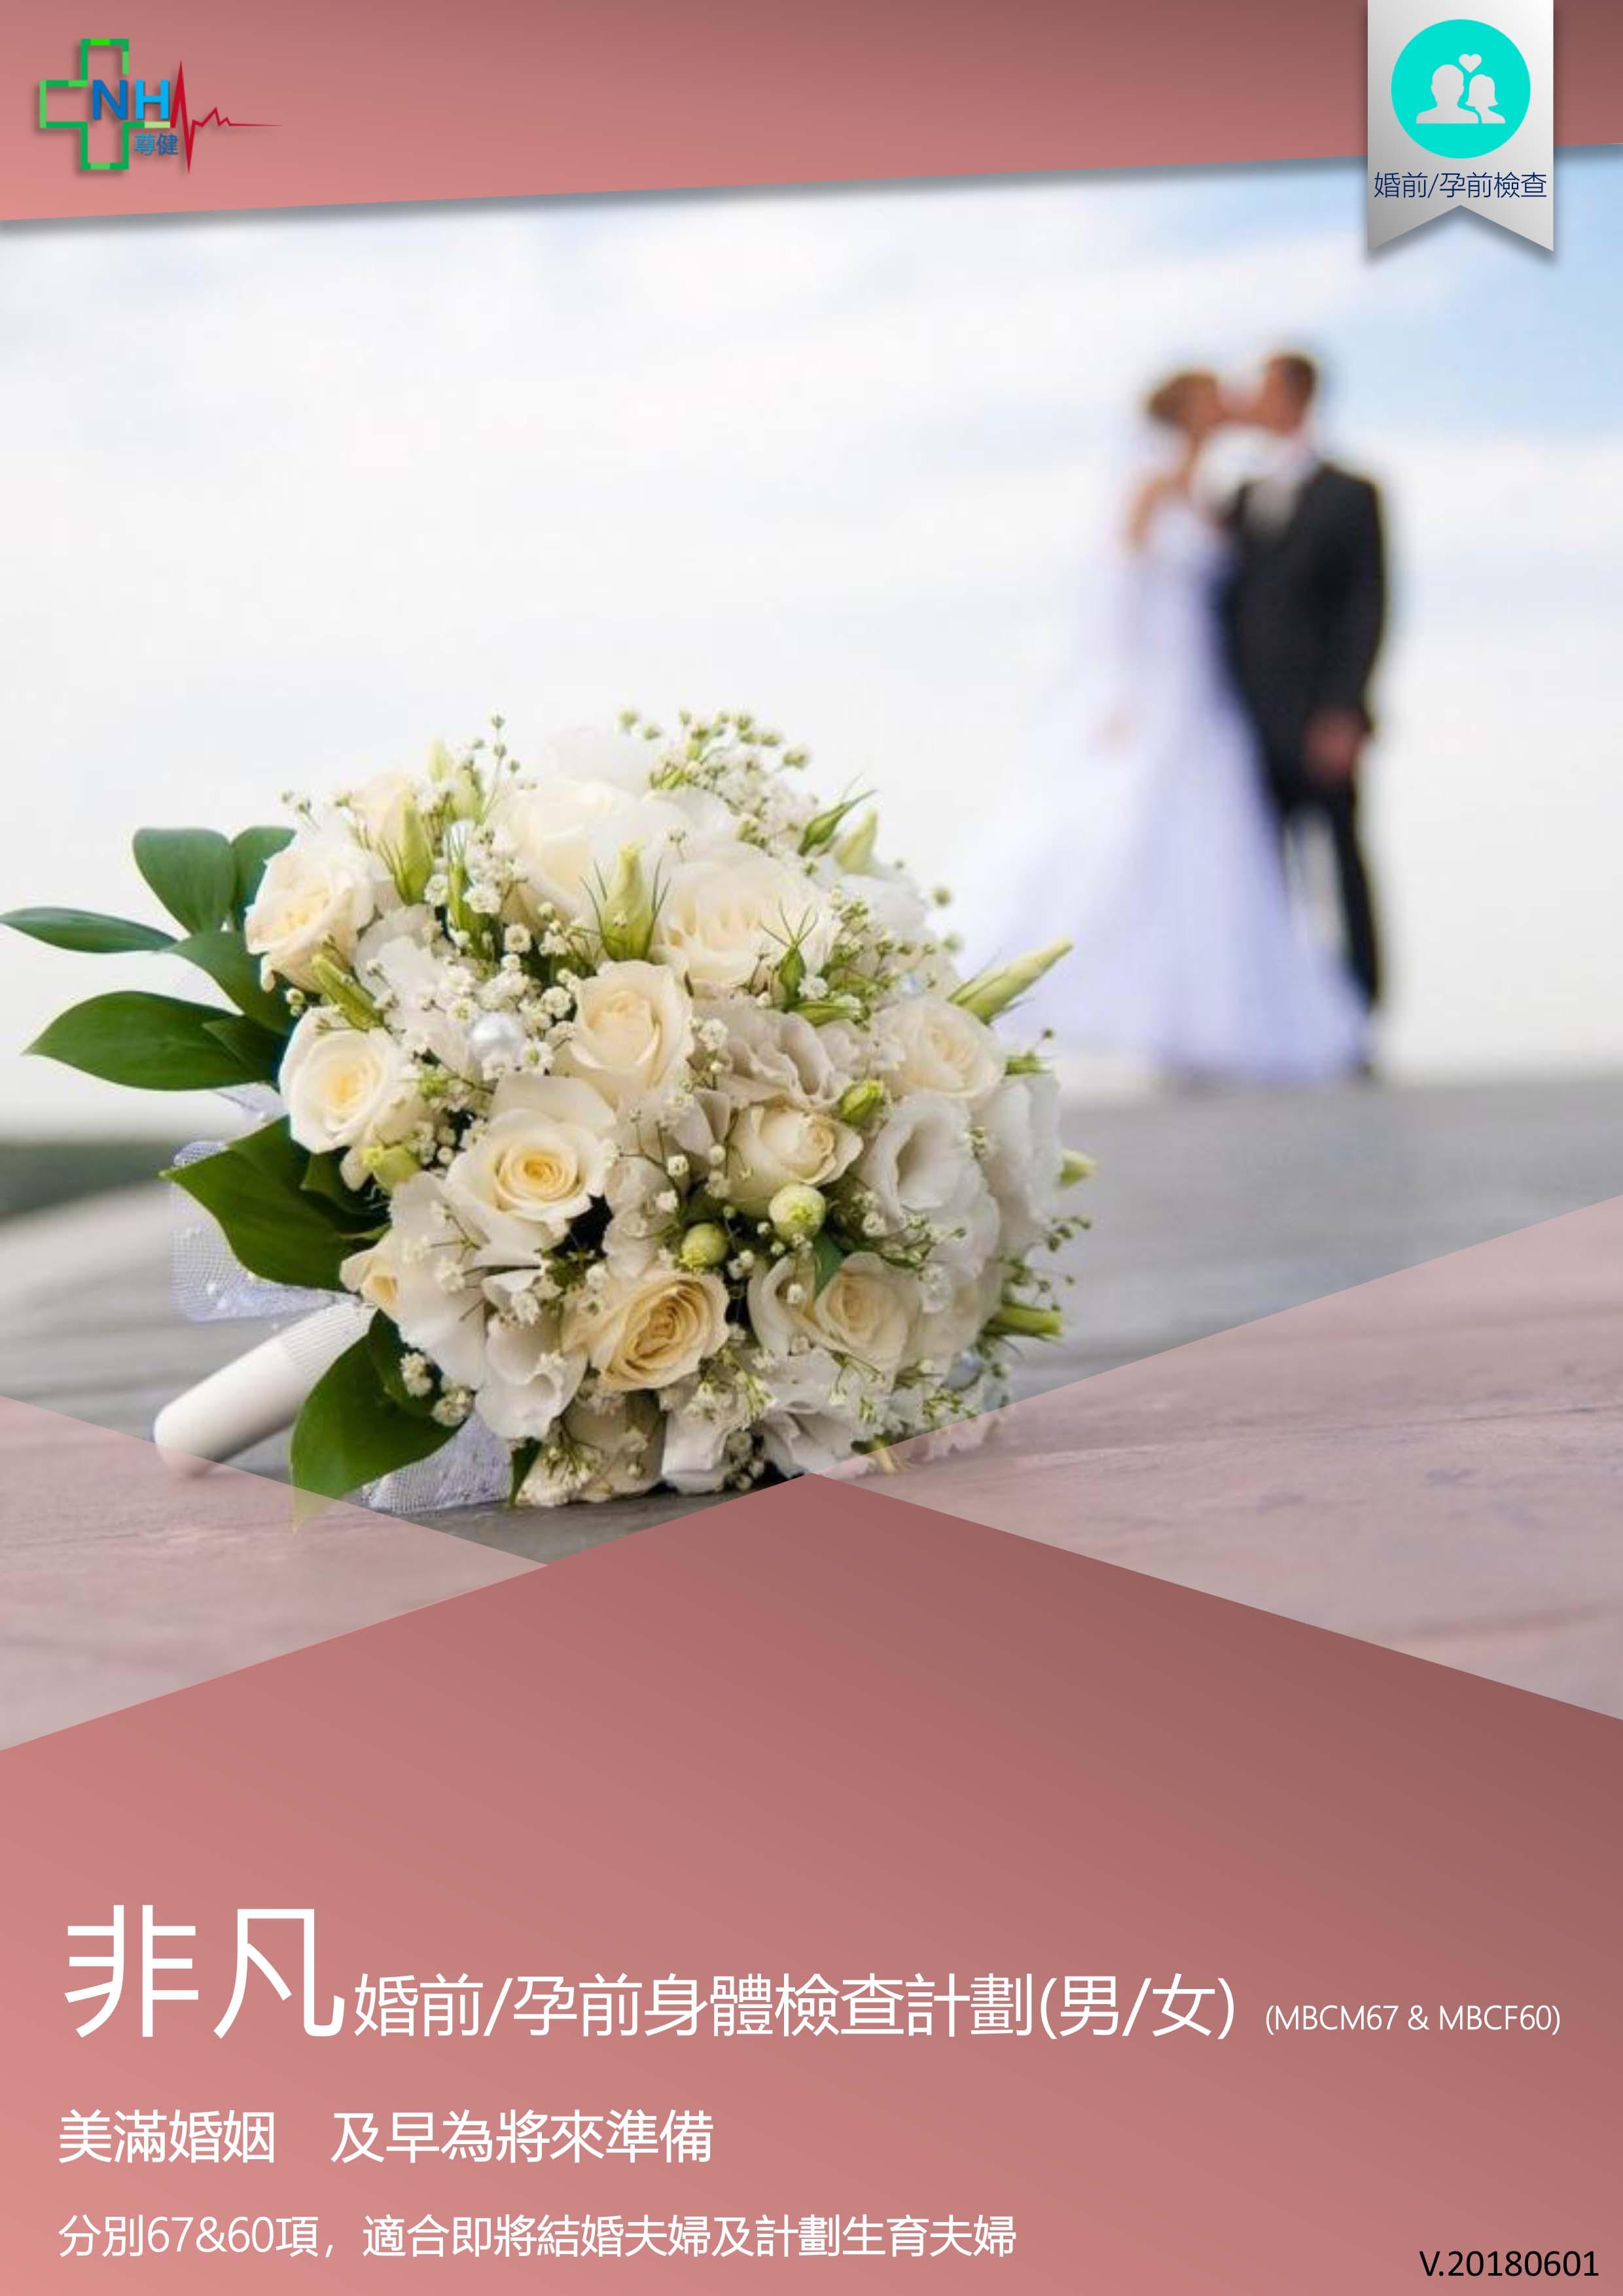 2c-pre-marital-body-check-60-1.jpg